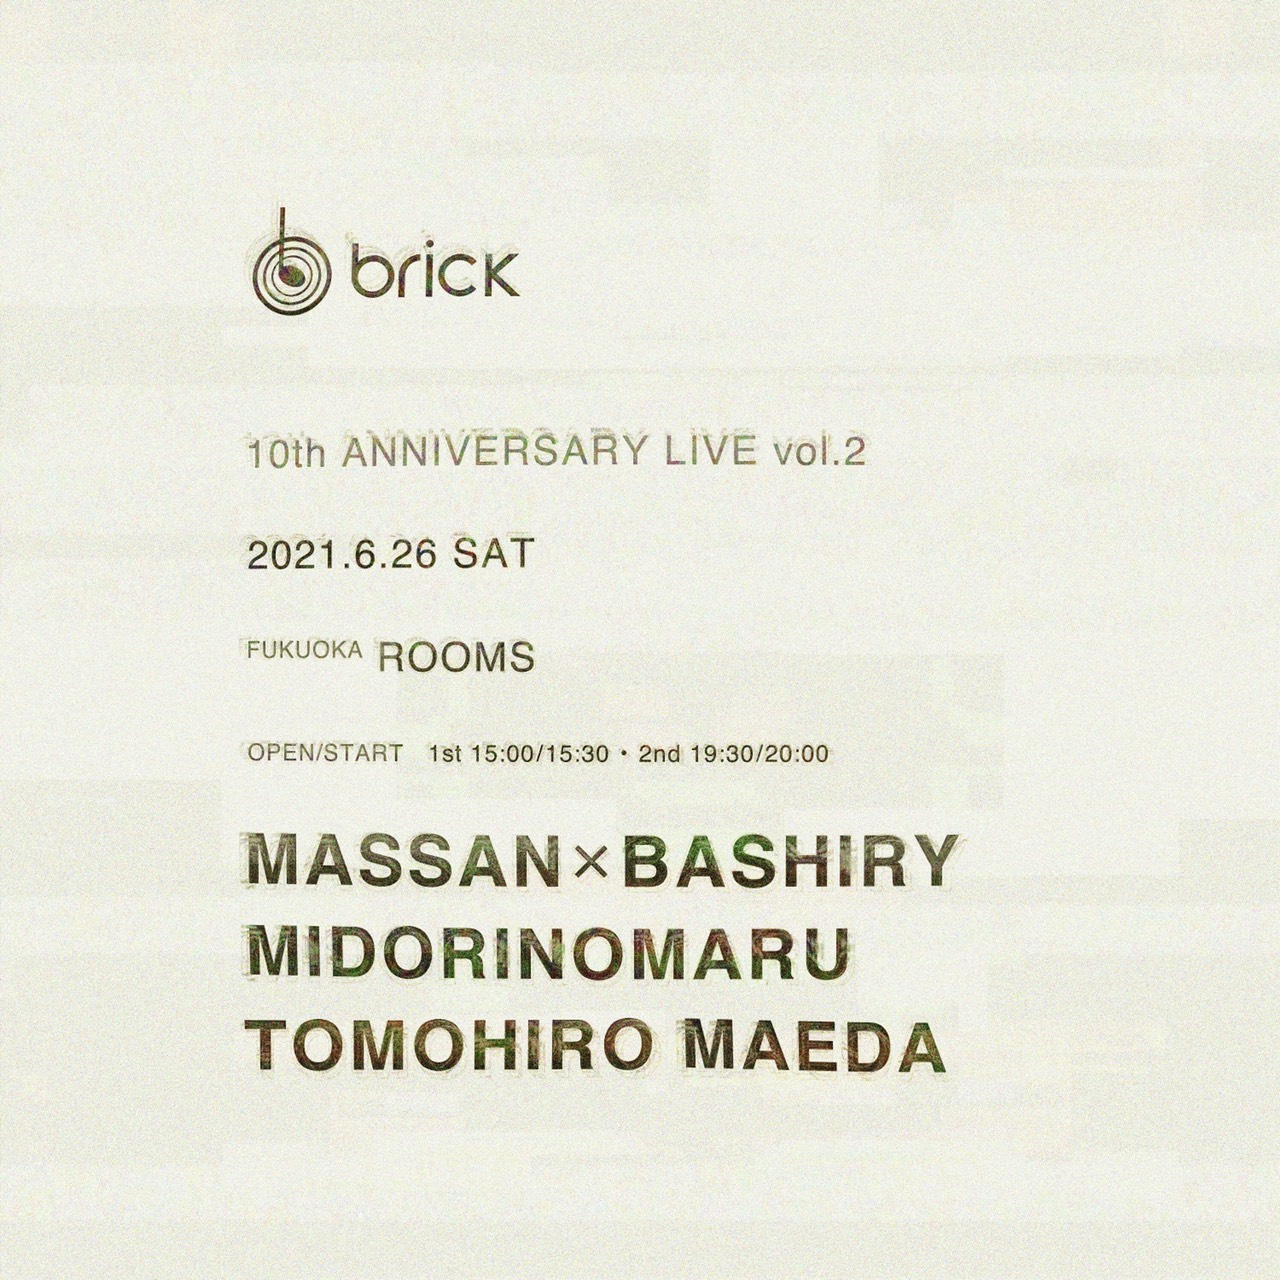 brick 10TH ANNIVERSARY LIVE vol.2 [ 2nd stage ]